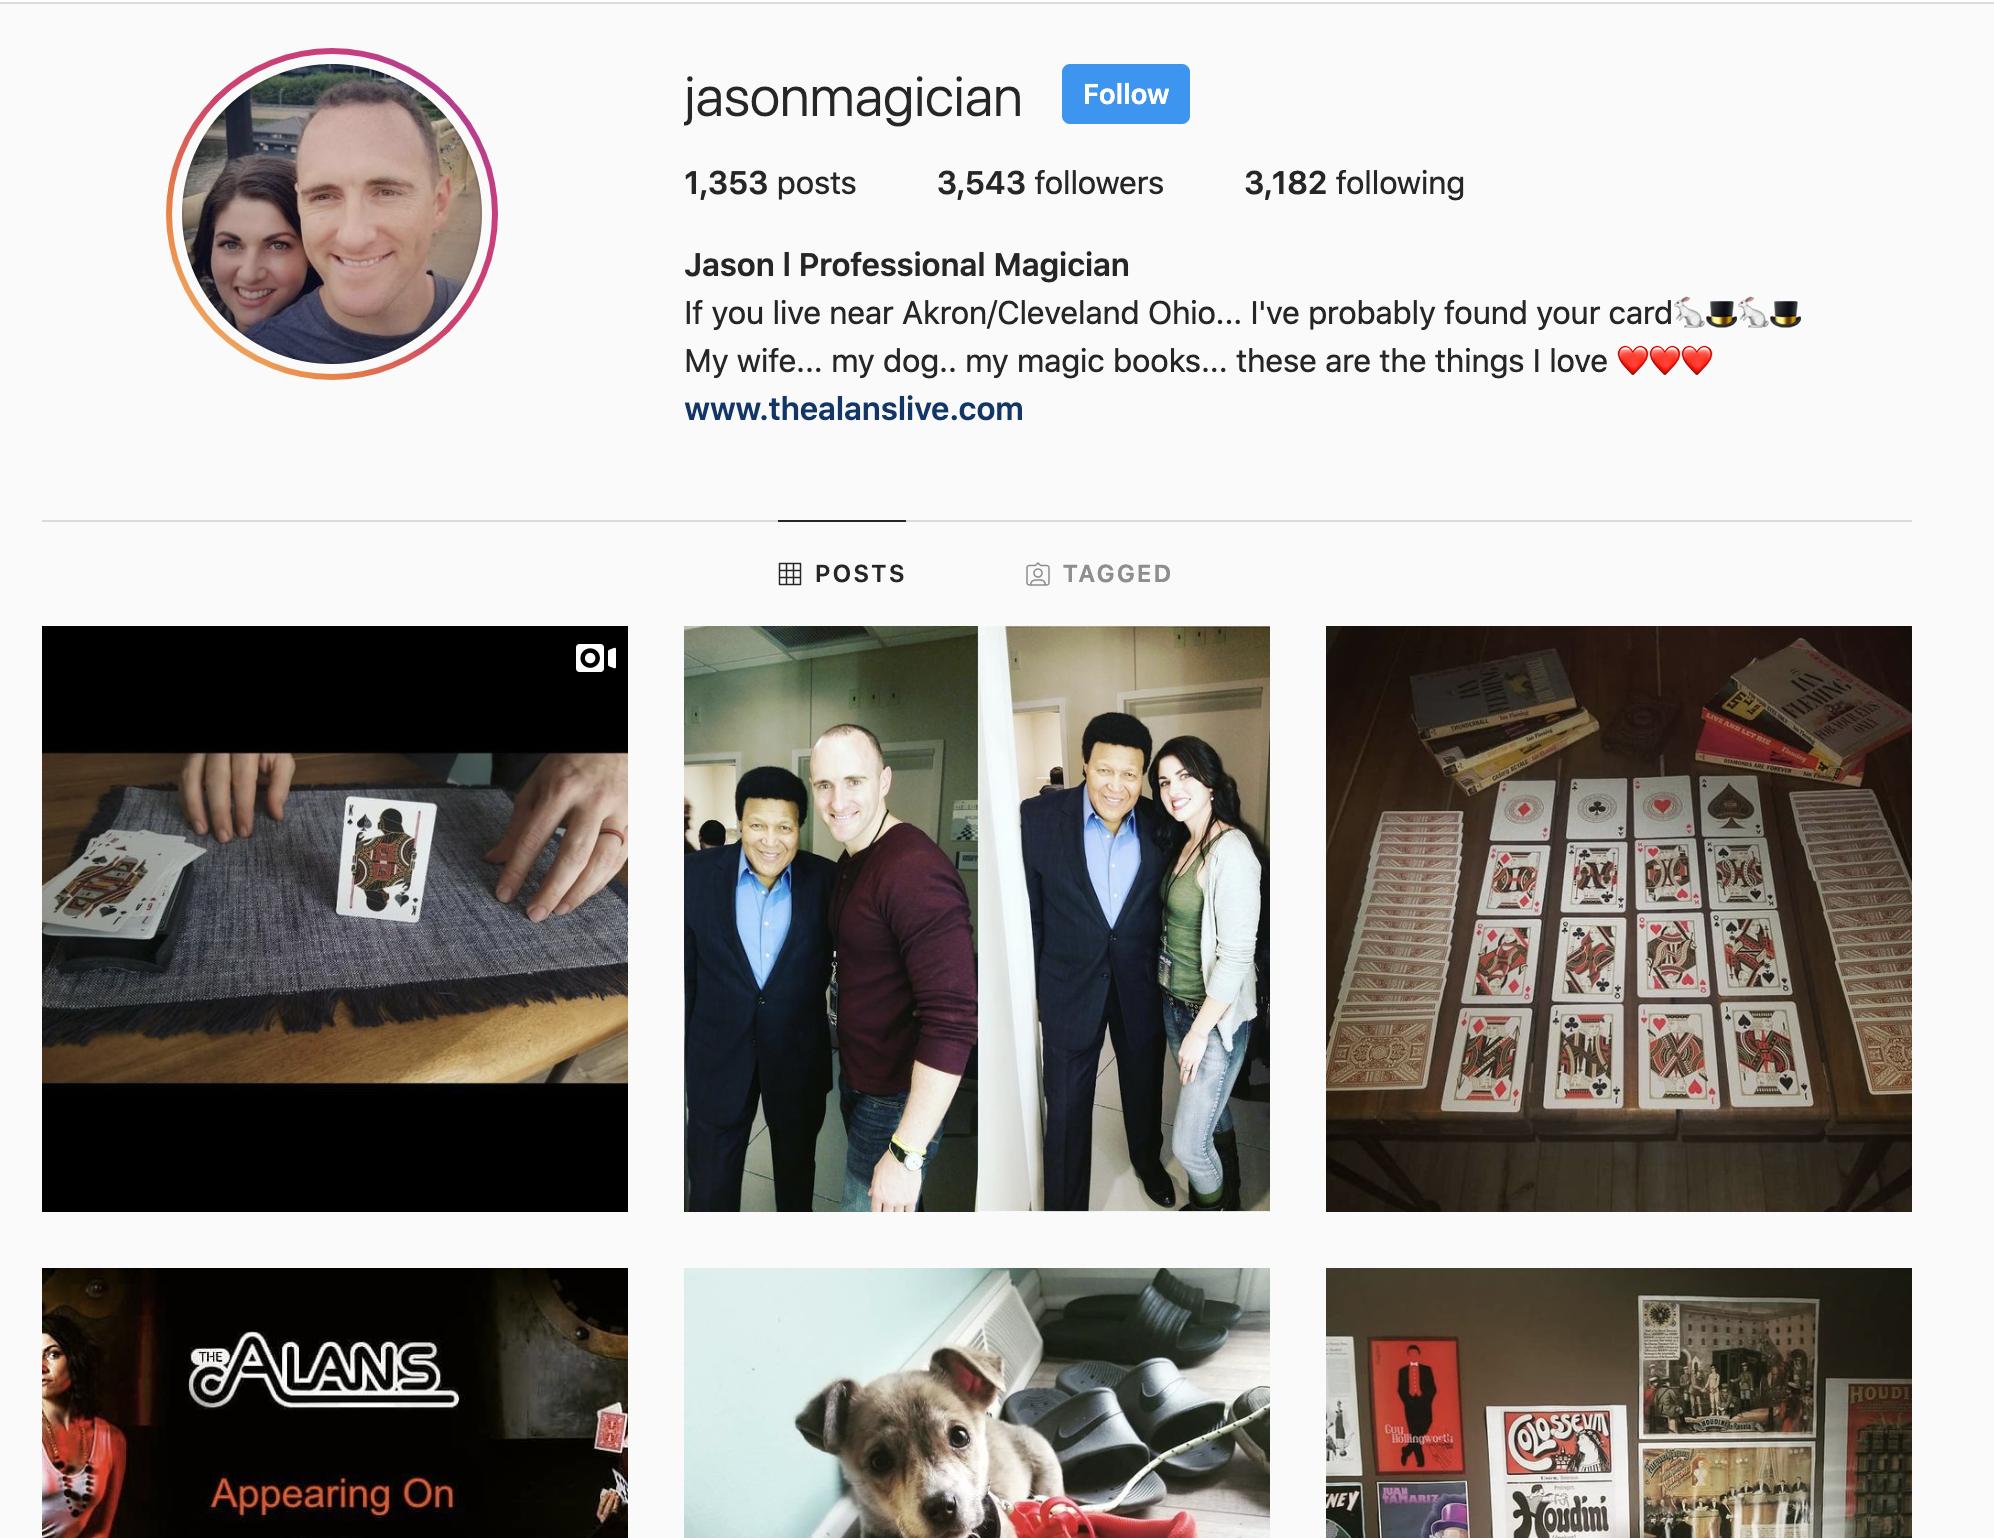 Jason Magician Instagram